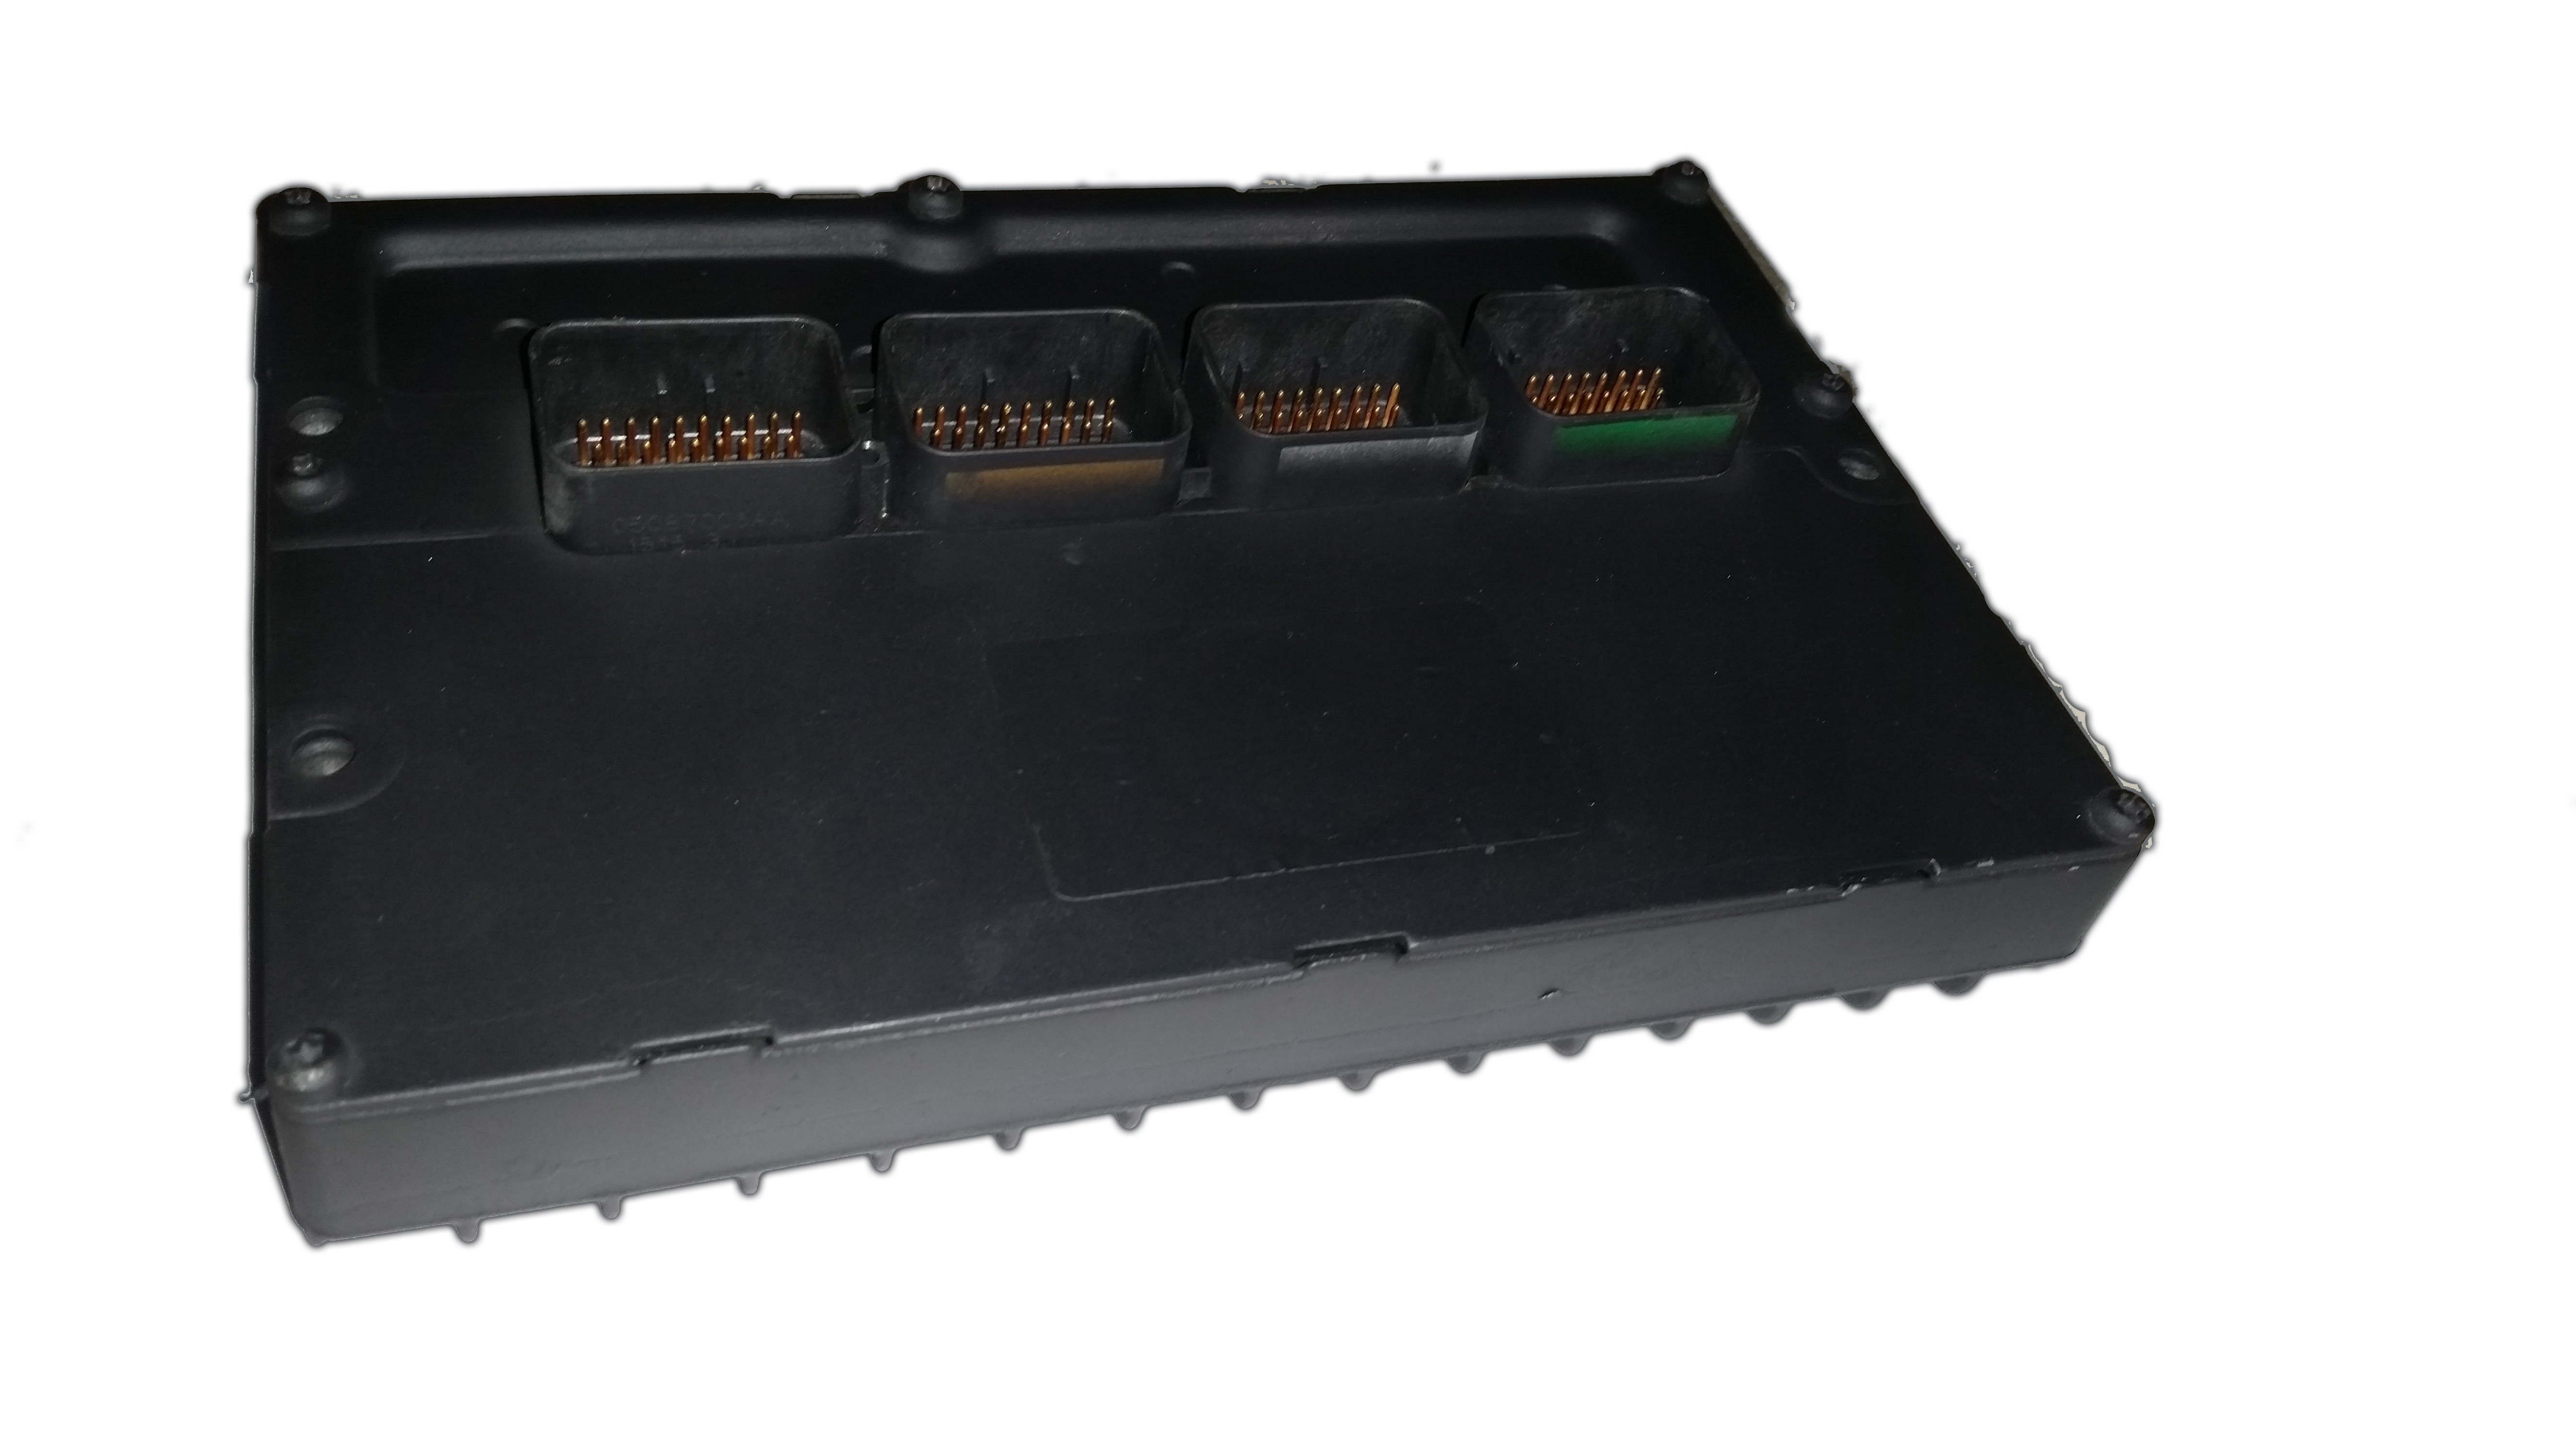 2005 Jeep Grand Cherokee 3.7L V6 Gas PCM / ECU / ECM Engine Computer